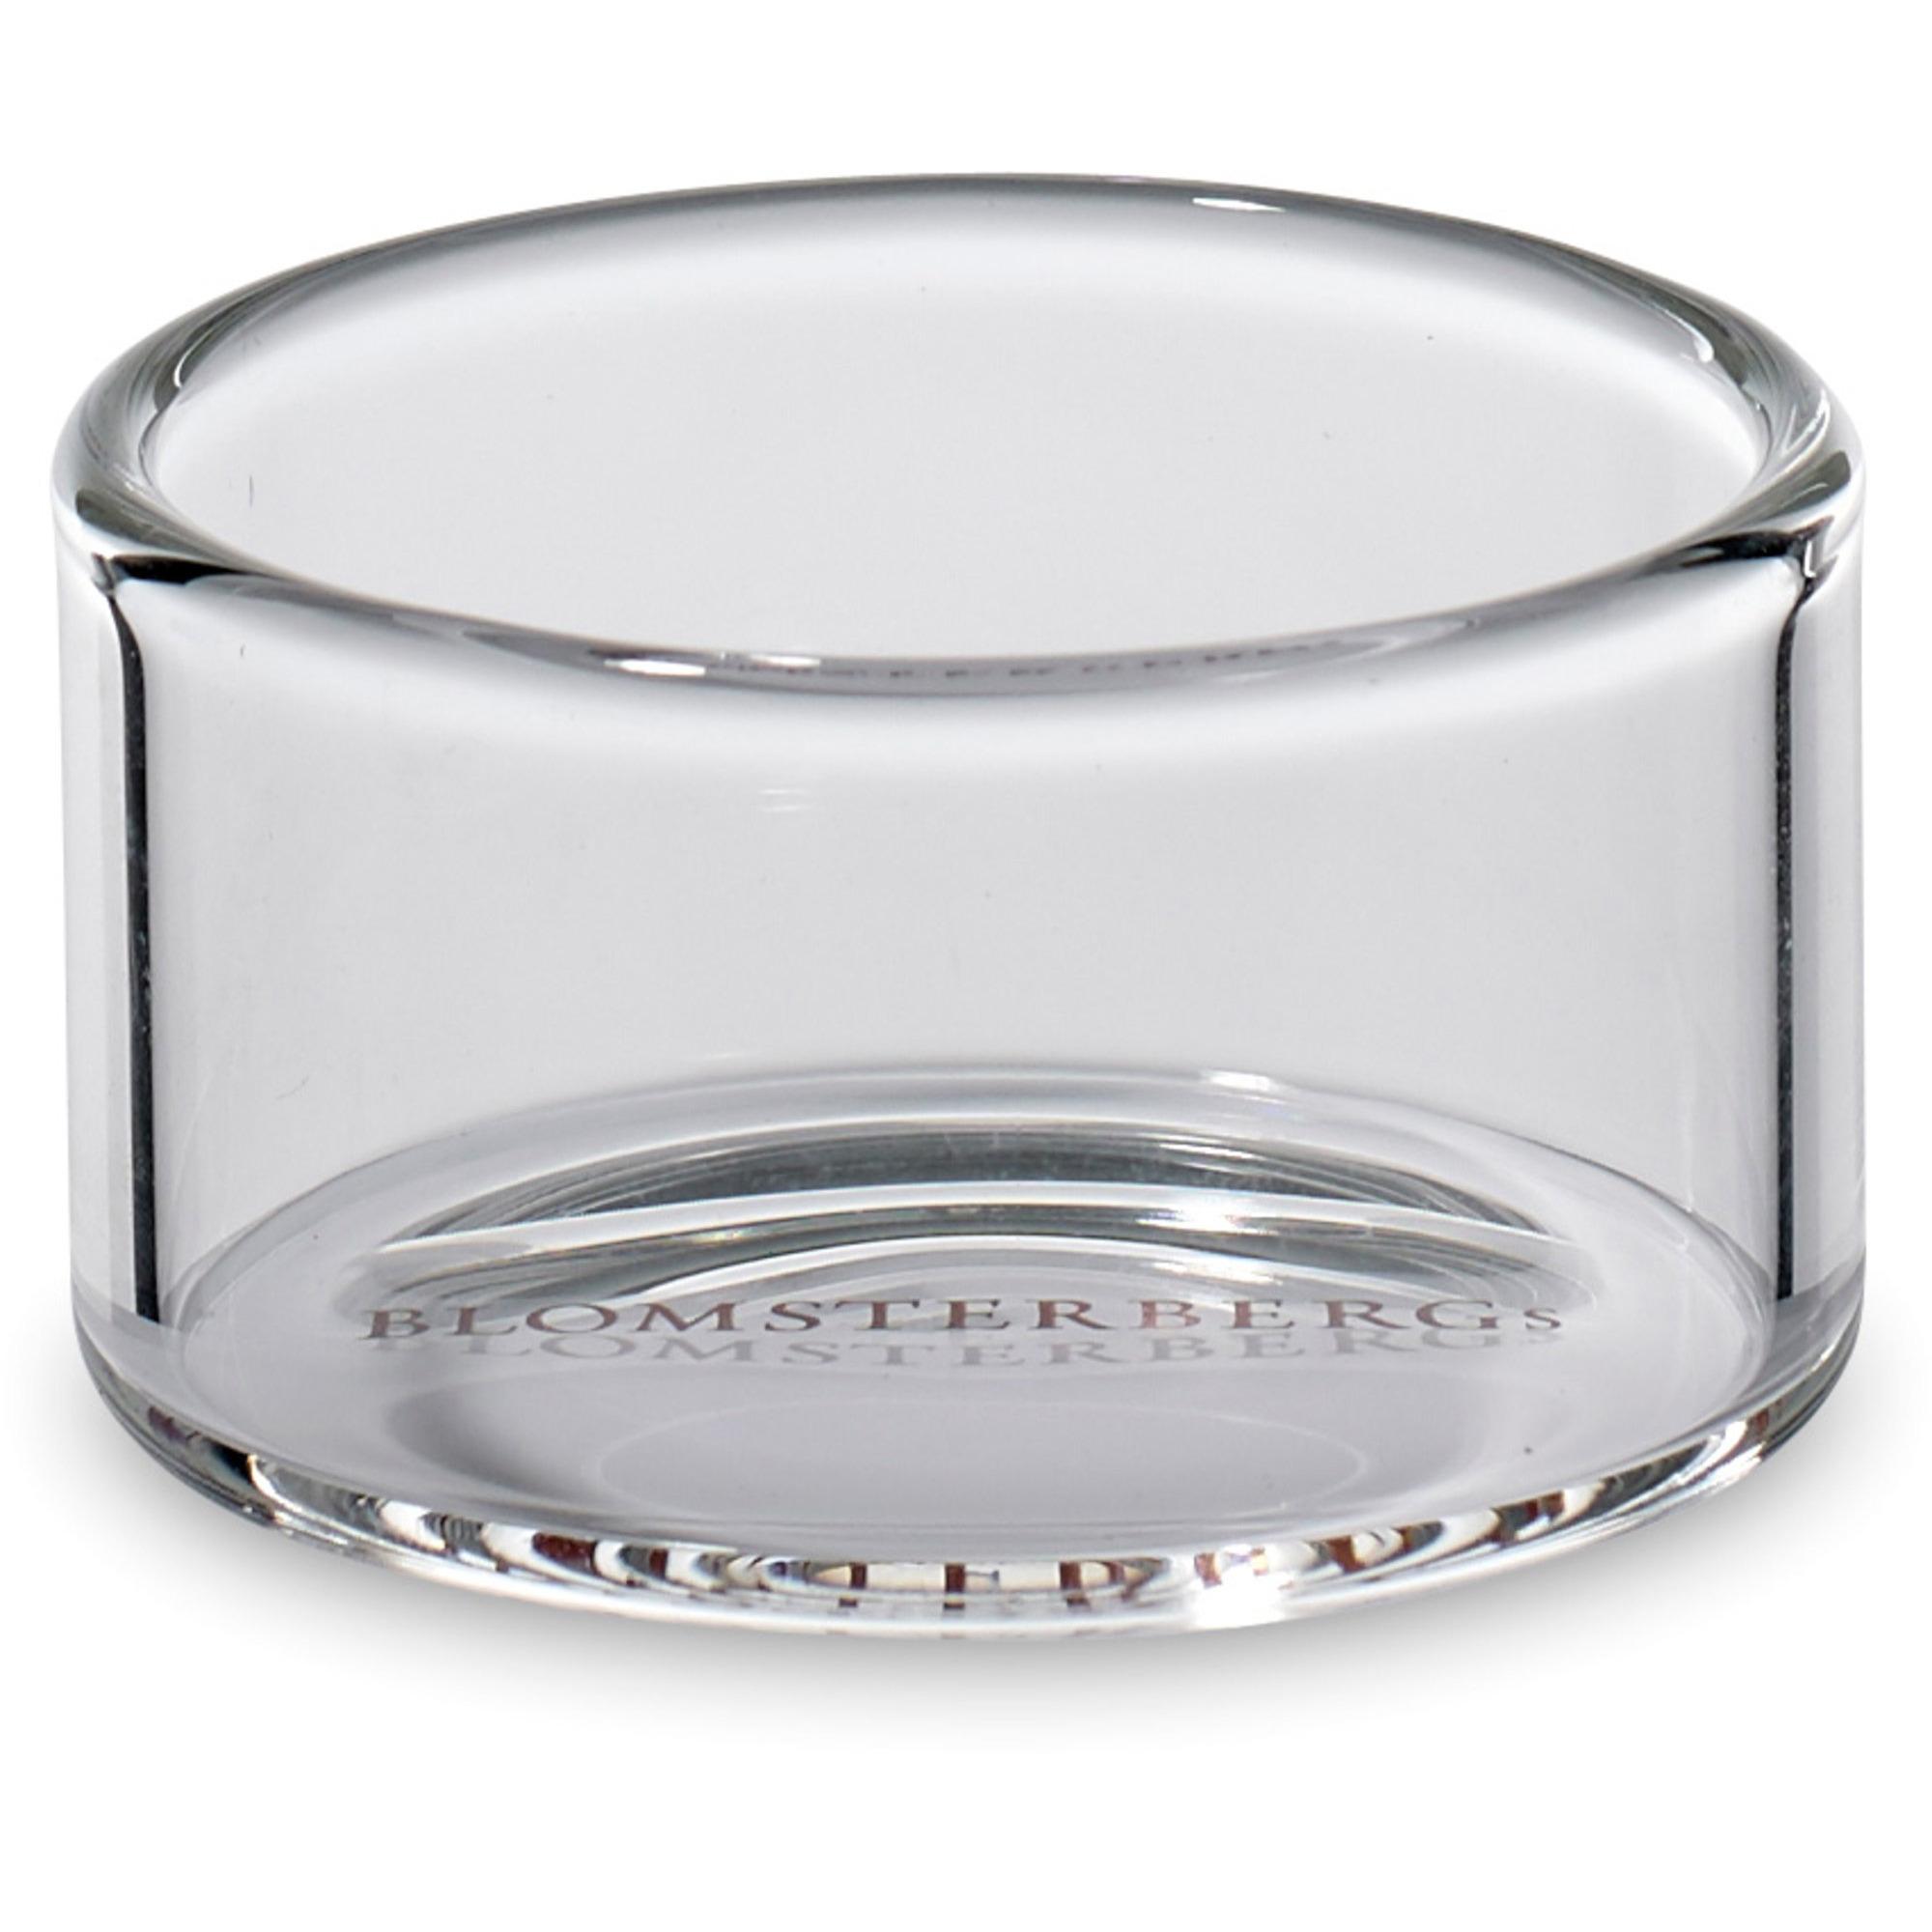 Blomsterbergs Serveringsglas Small 6 st